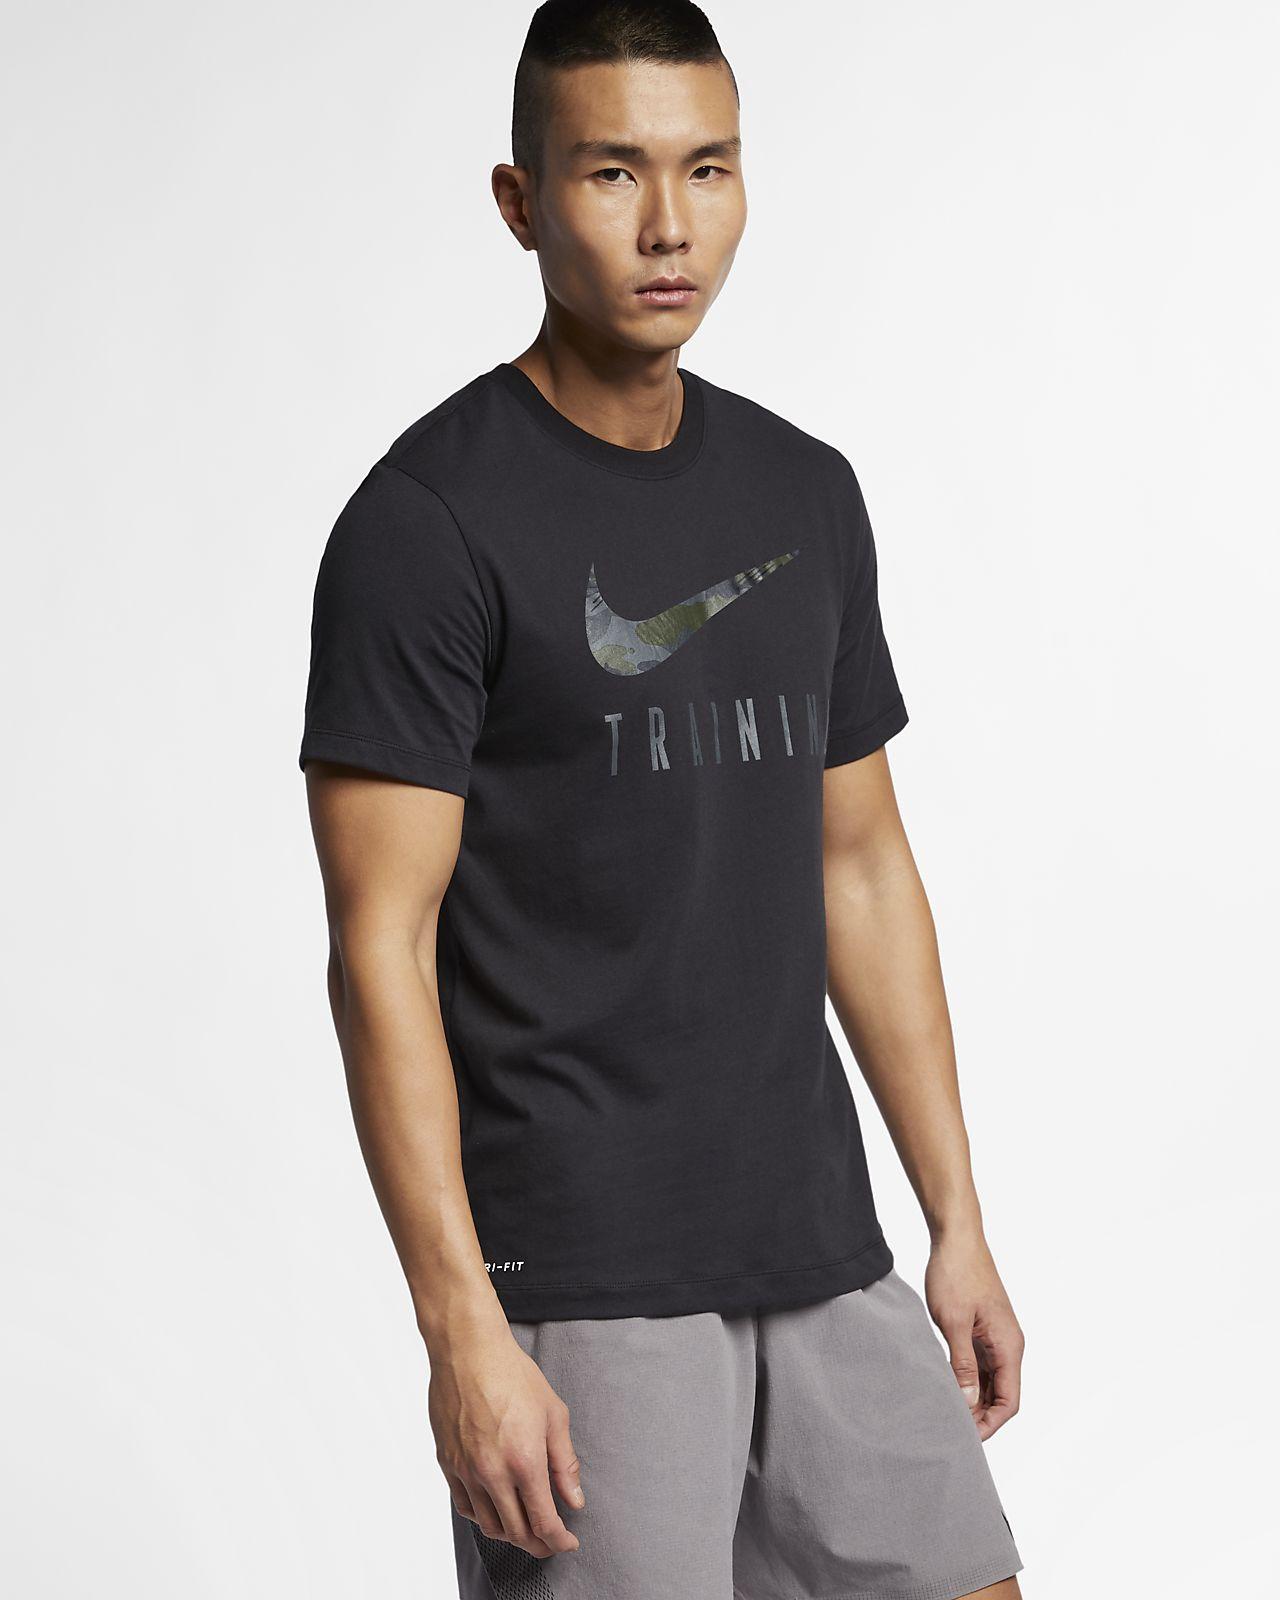 ff98afef932 Playera de entrenamiento para hombre Nike Dri-FIT. Nike.com MX